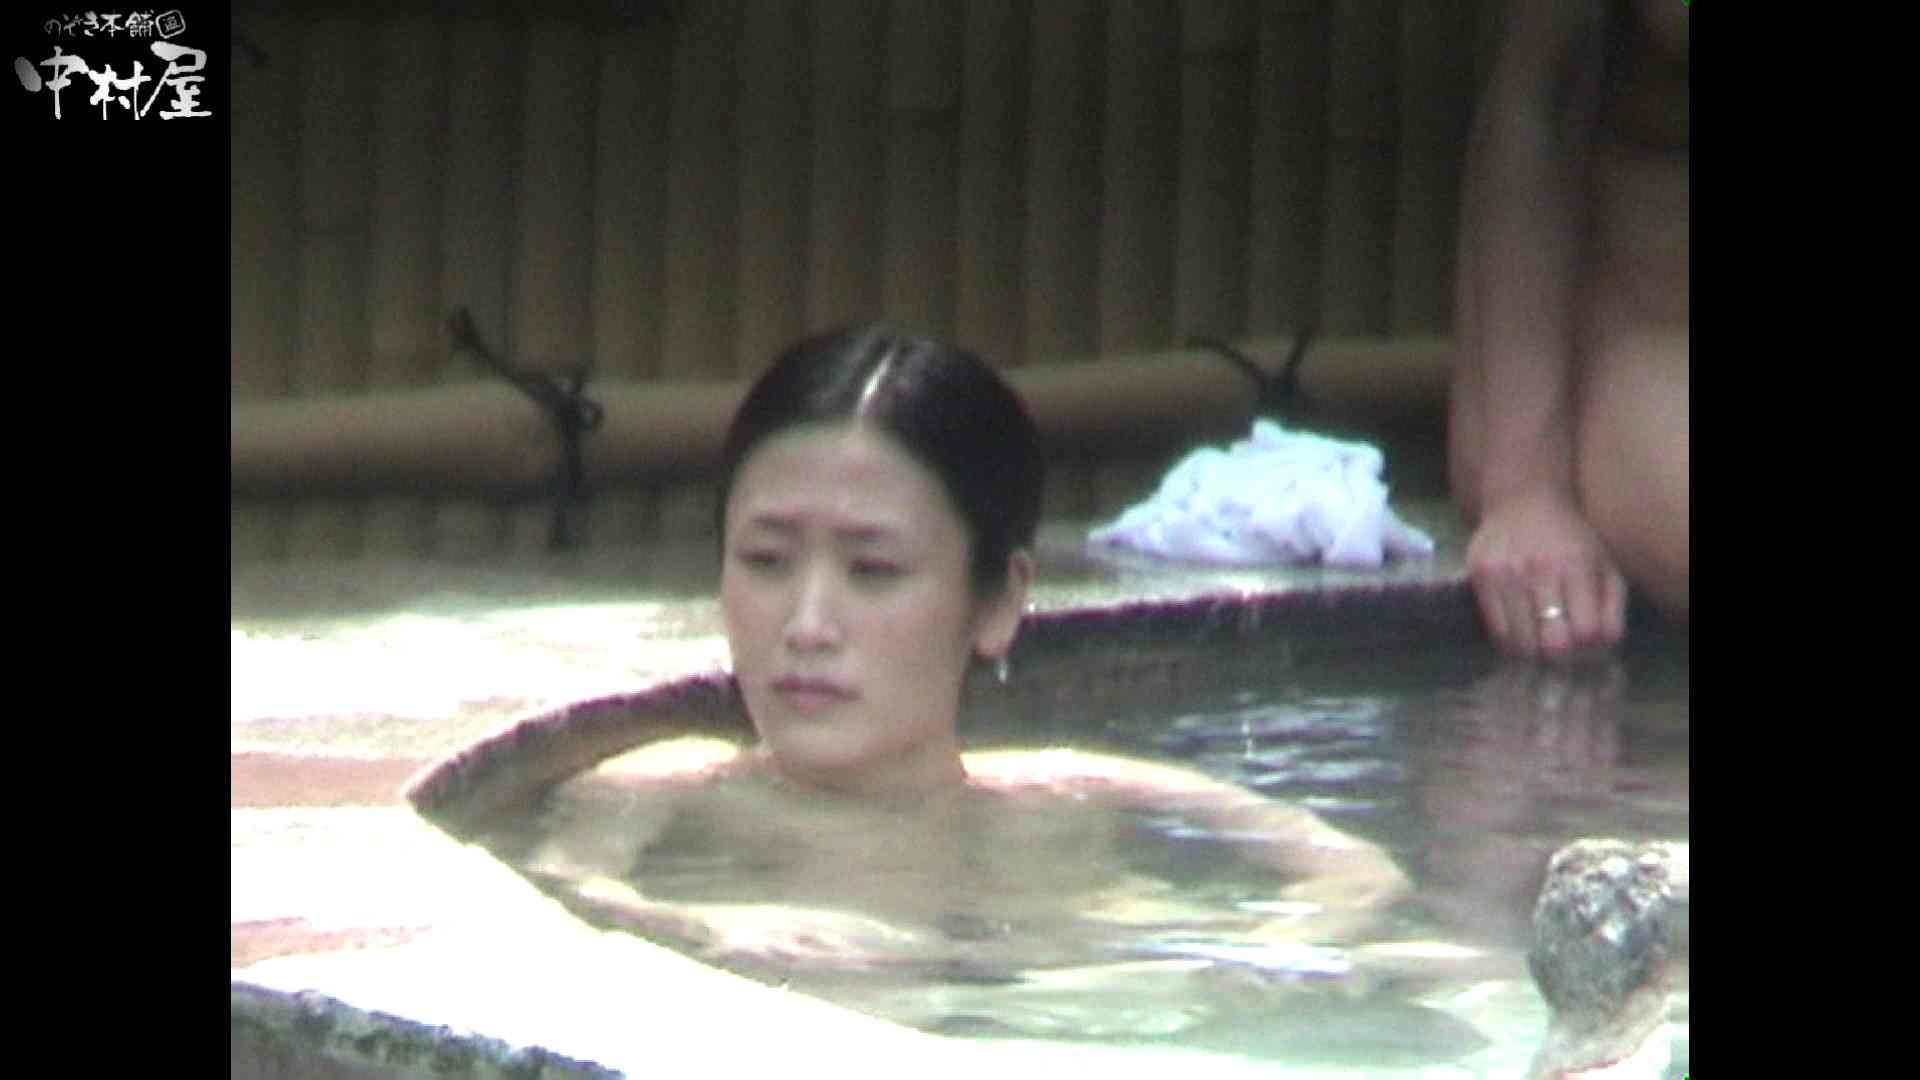 Aquaな露天風呂Vol.934 盗撮 AV無料 66画像 11